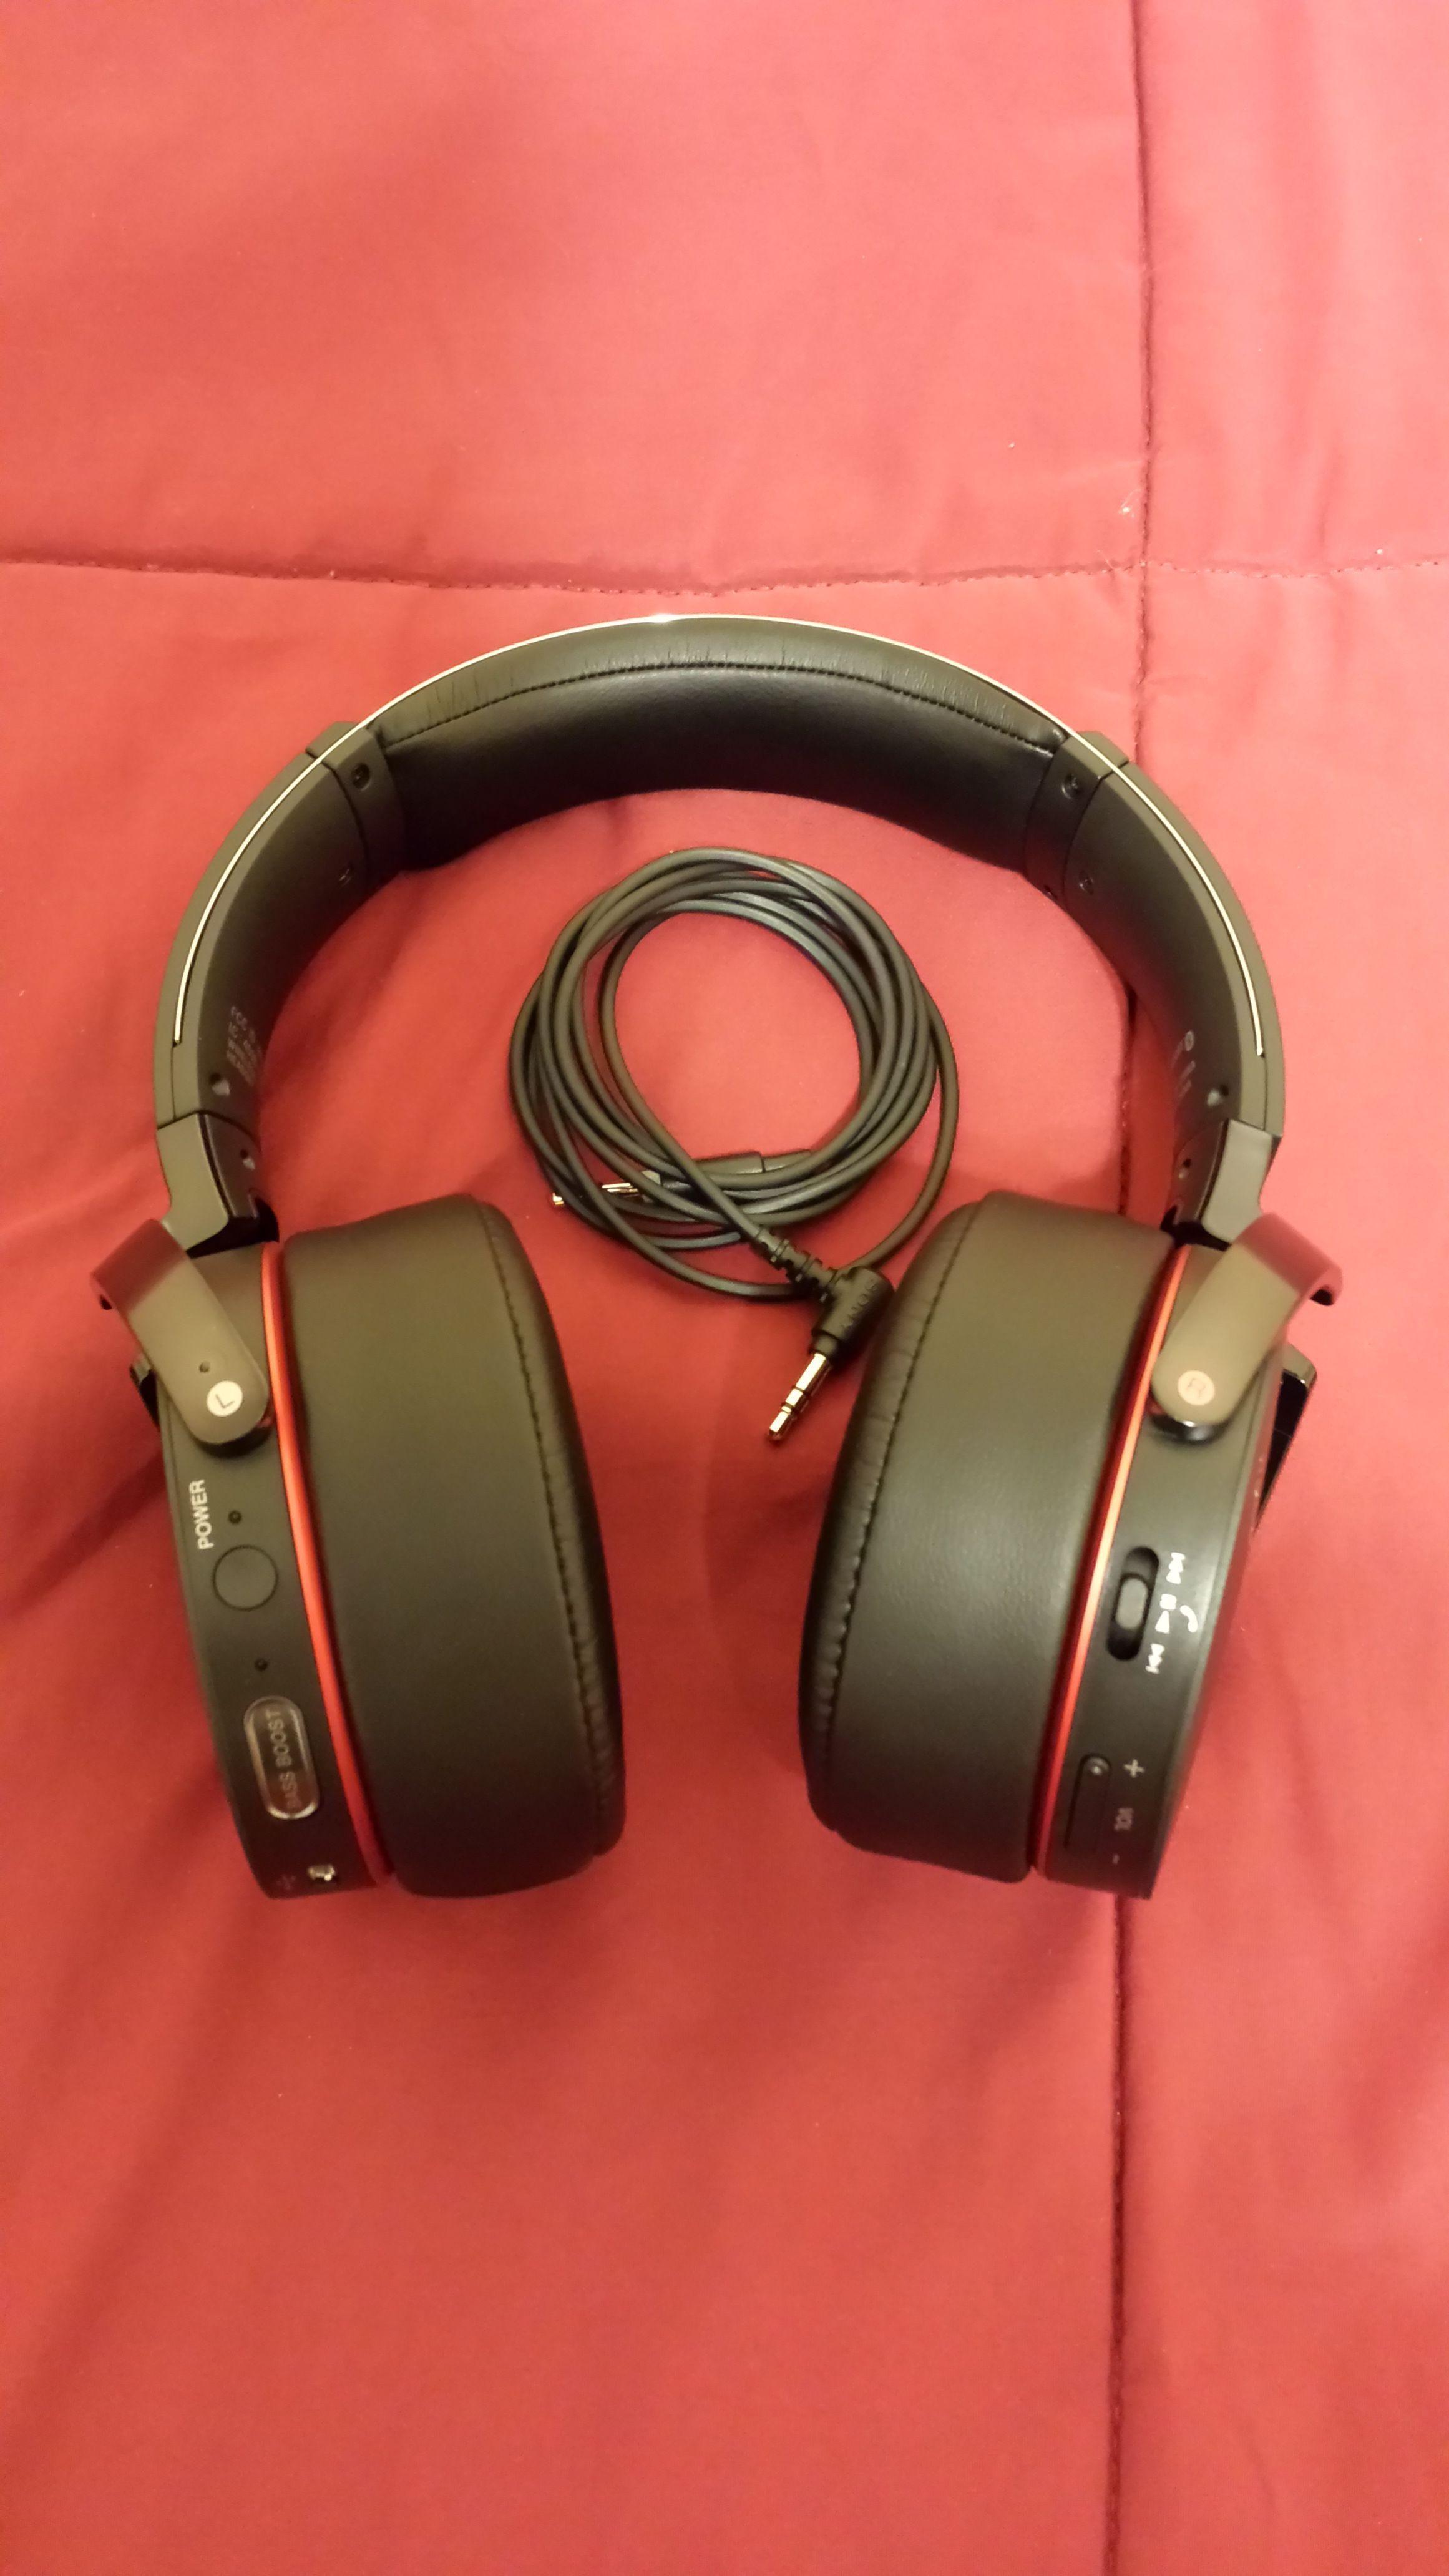 6600682 sony mdr xb950bt bluetooth headphones head fi org  at bakdesigns.co